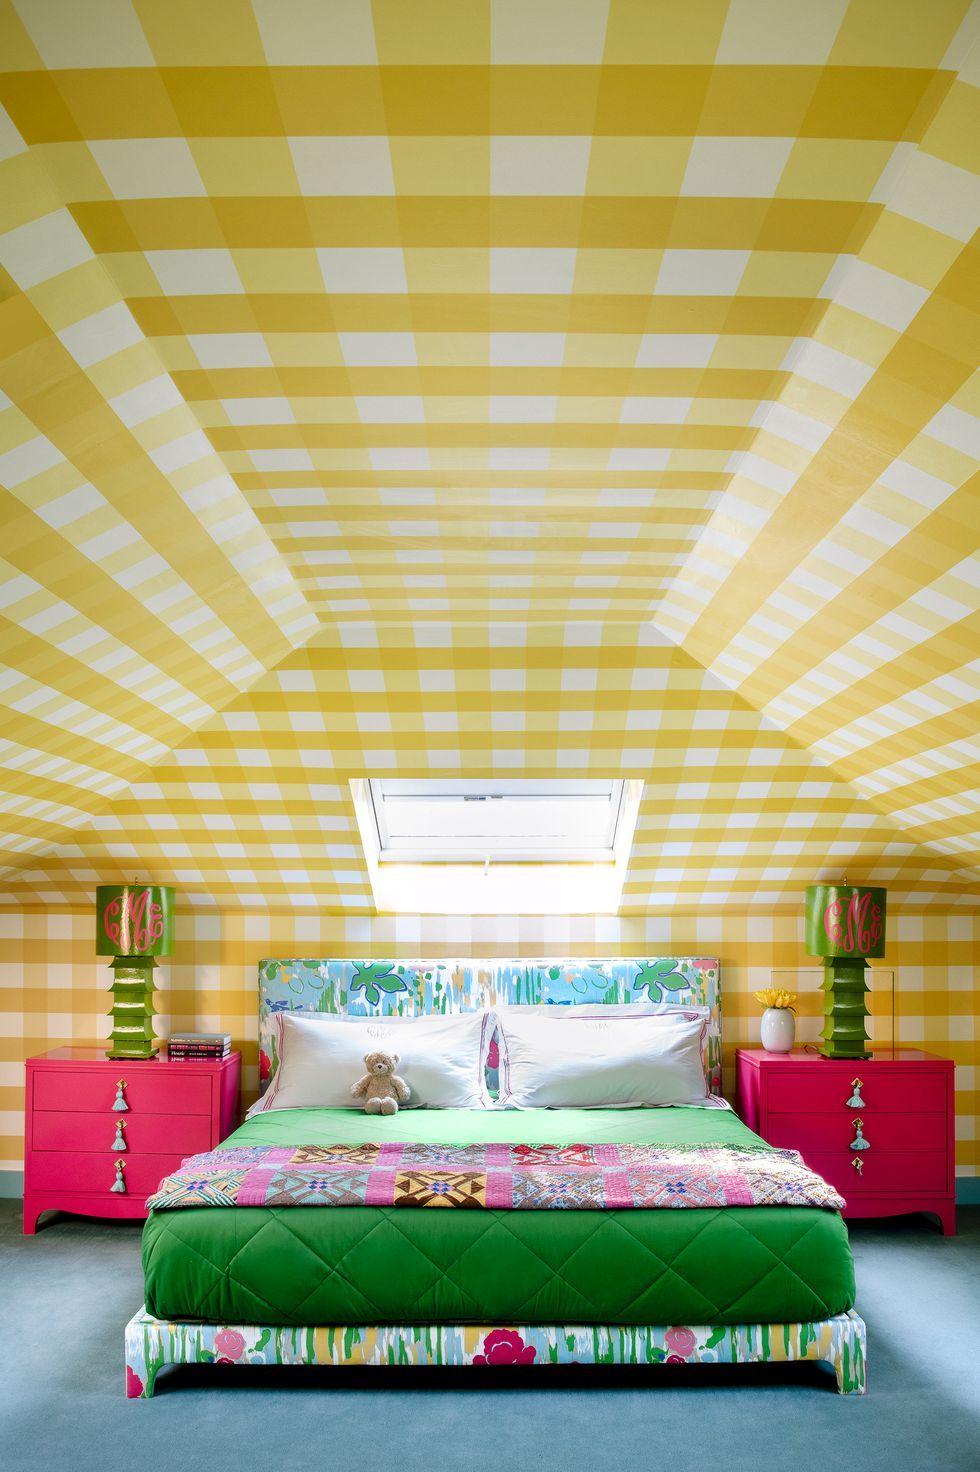 55 Kids Room Design Ideas Cool Kids Bedroom Decor And